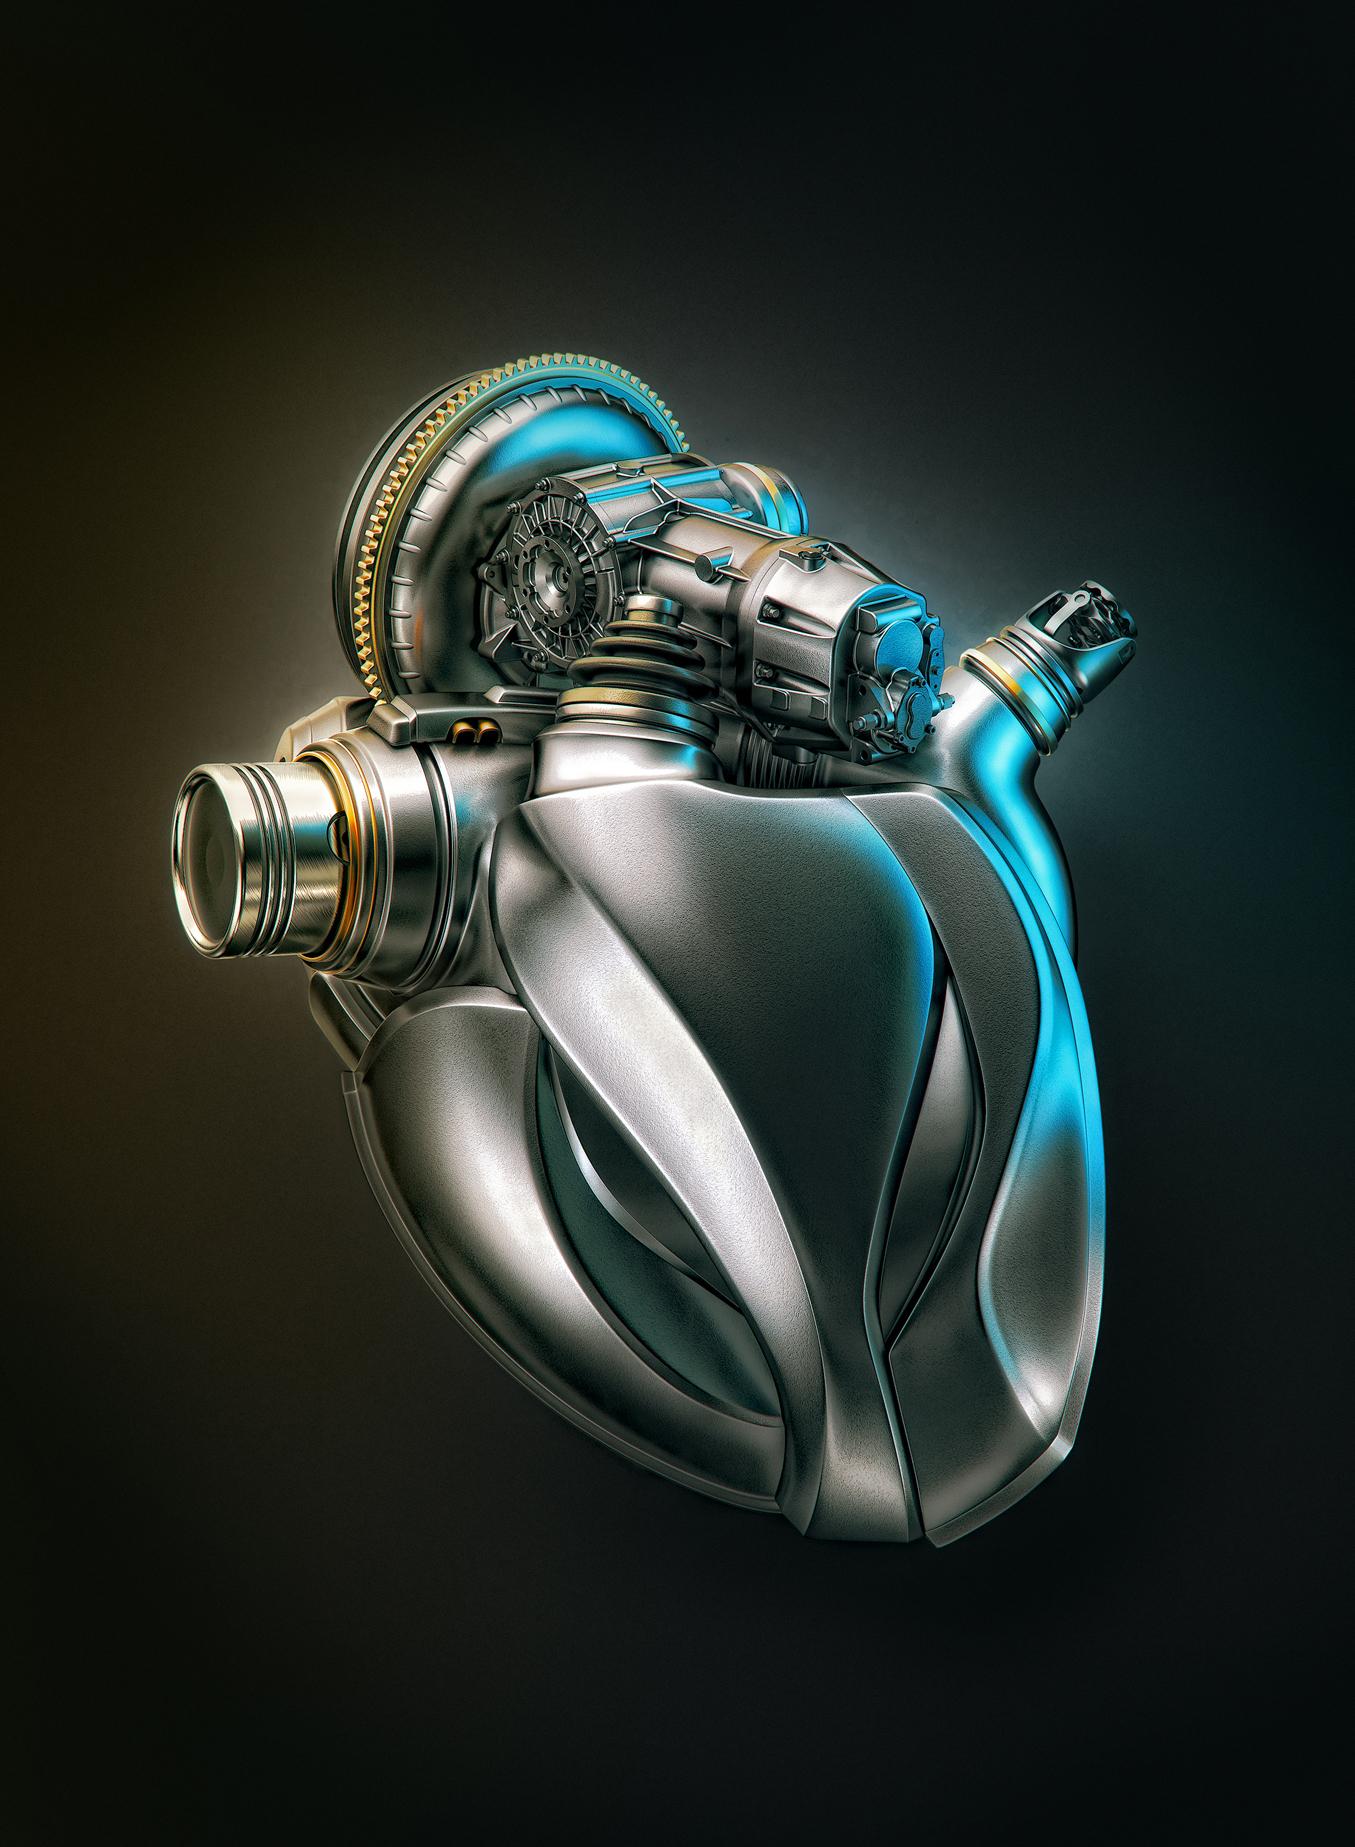 Alekscg acura engine 1 e313228a 2e7n